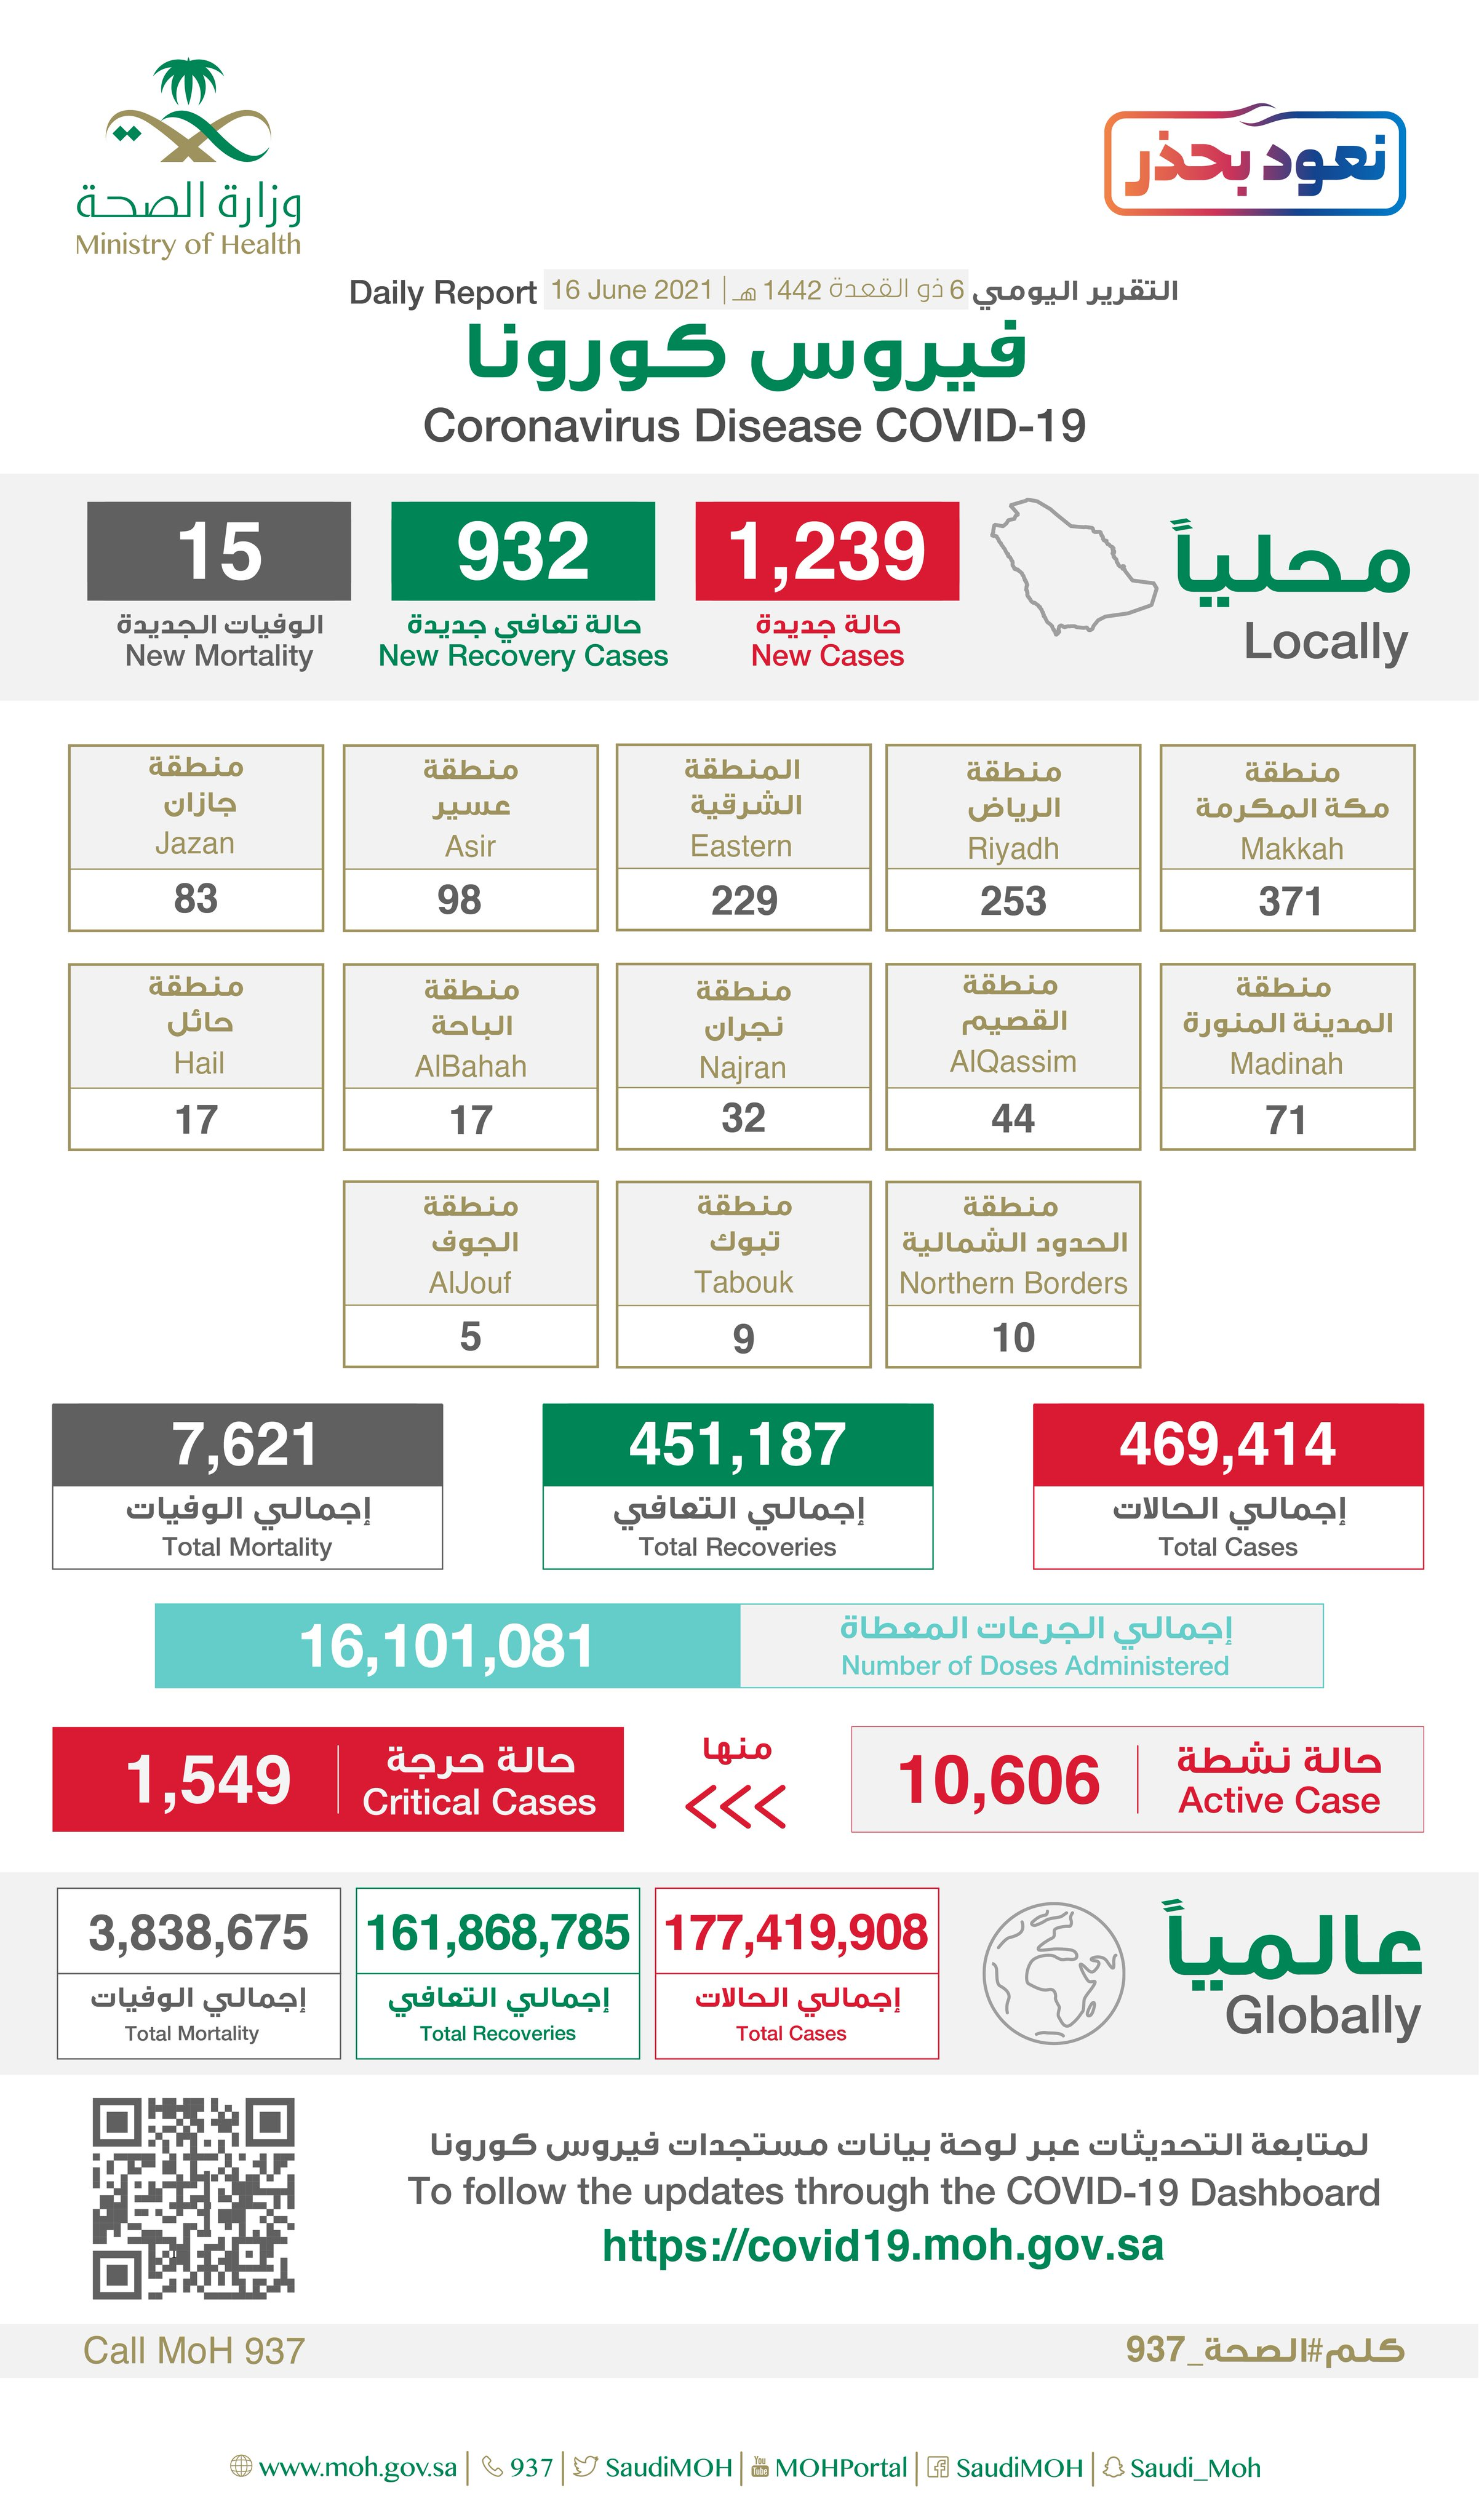 Saudi Arabia Coronavirus : Total Cases :469,414 , New Cases : 1,239 , Cured : 451,187 , Deaths: 7,621, Active Cases : 10,606